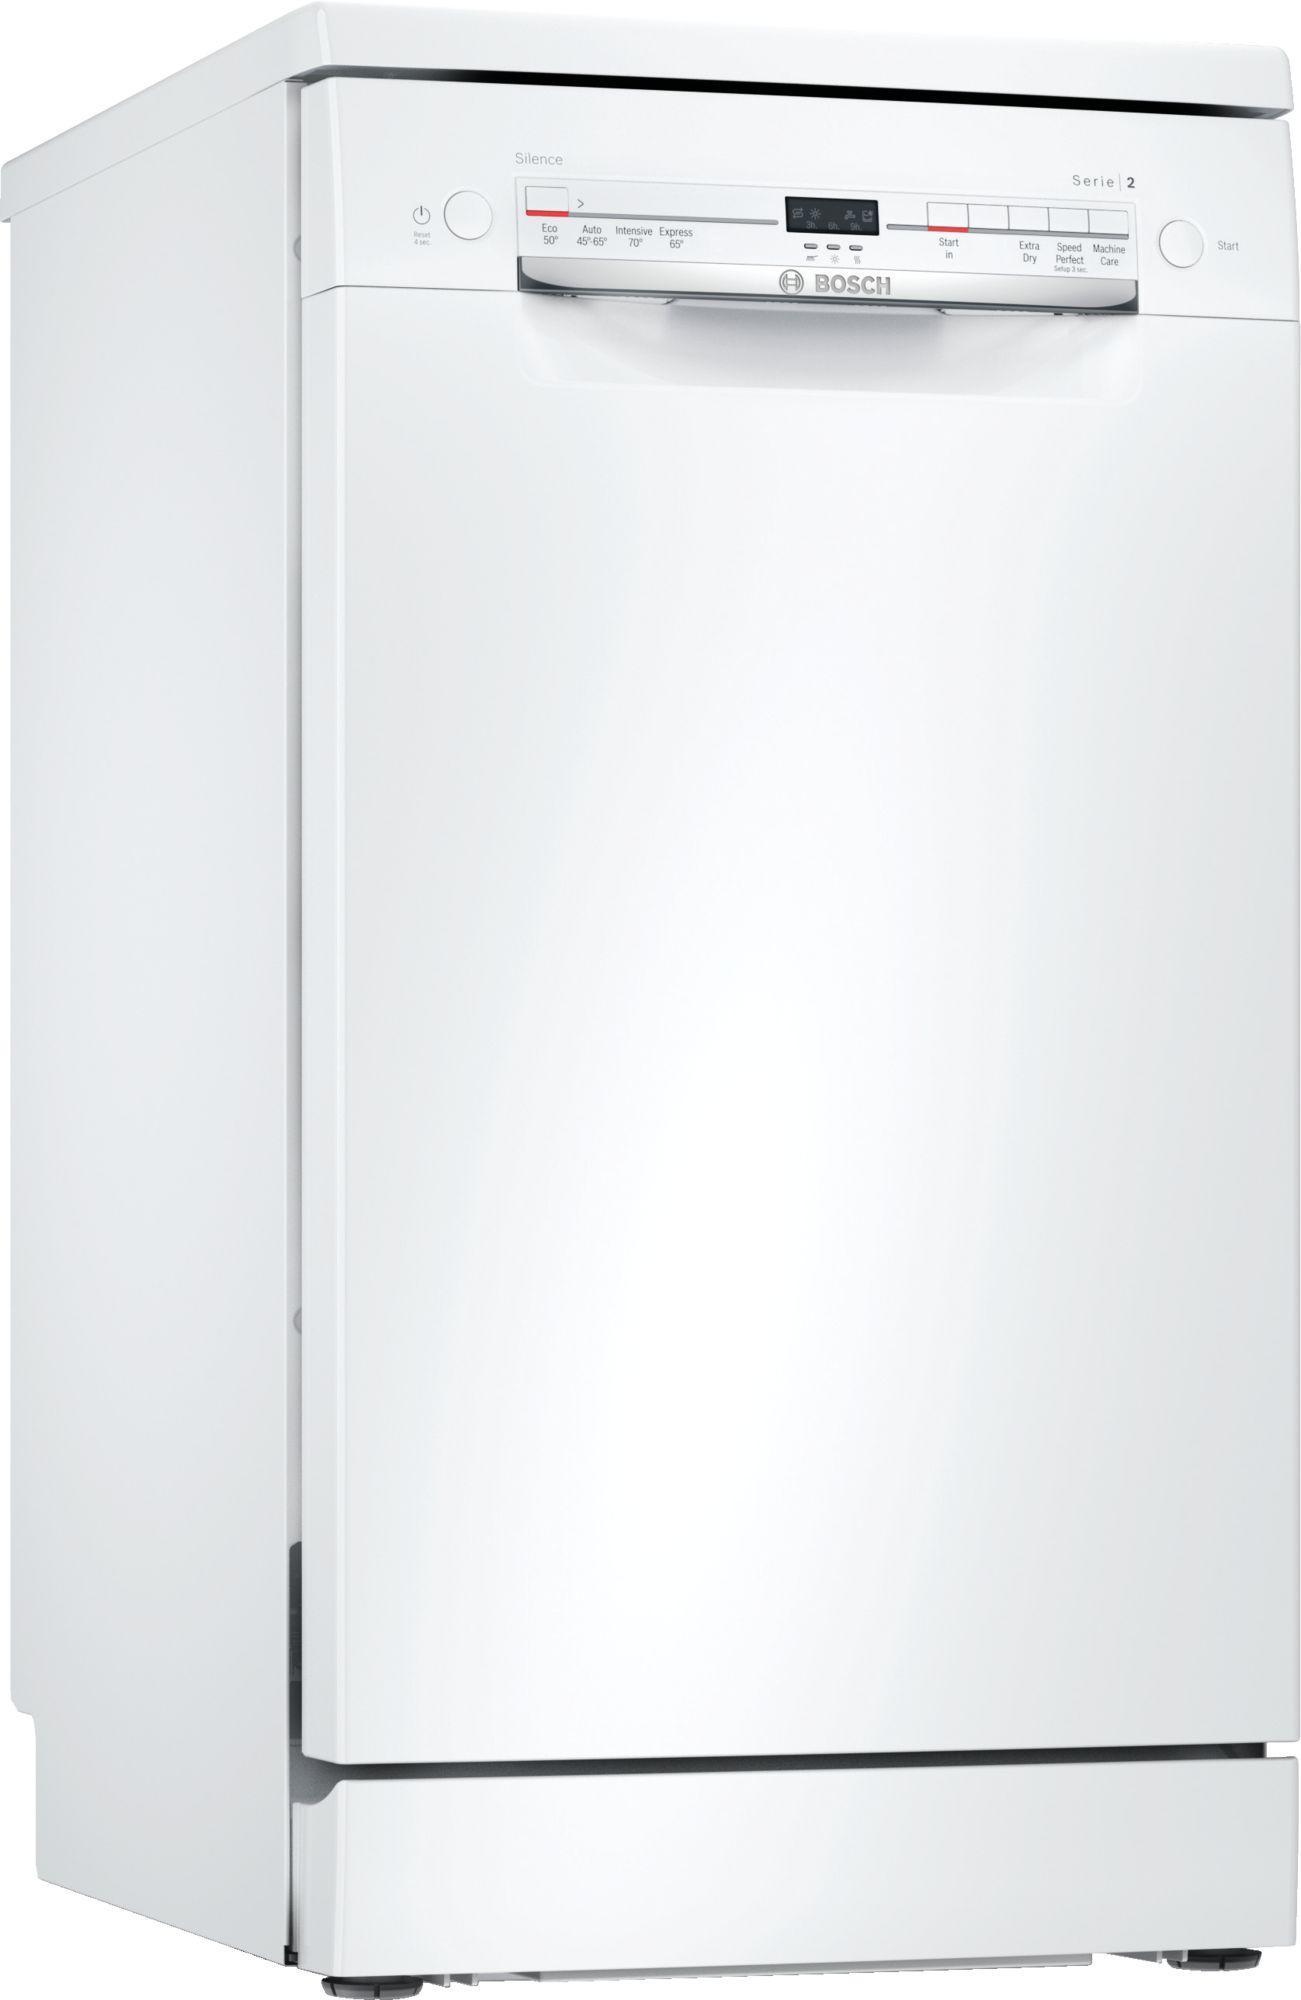 Image of Serie 2 SRS2IKW04G 45cm Slimline Dishwasher   White